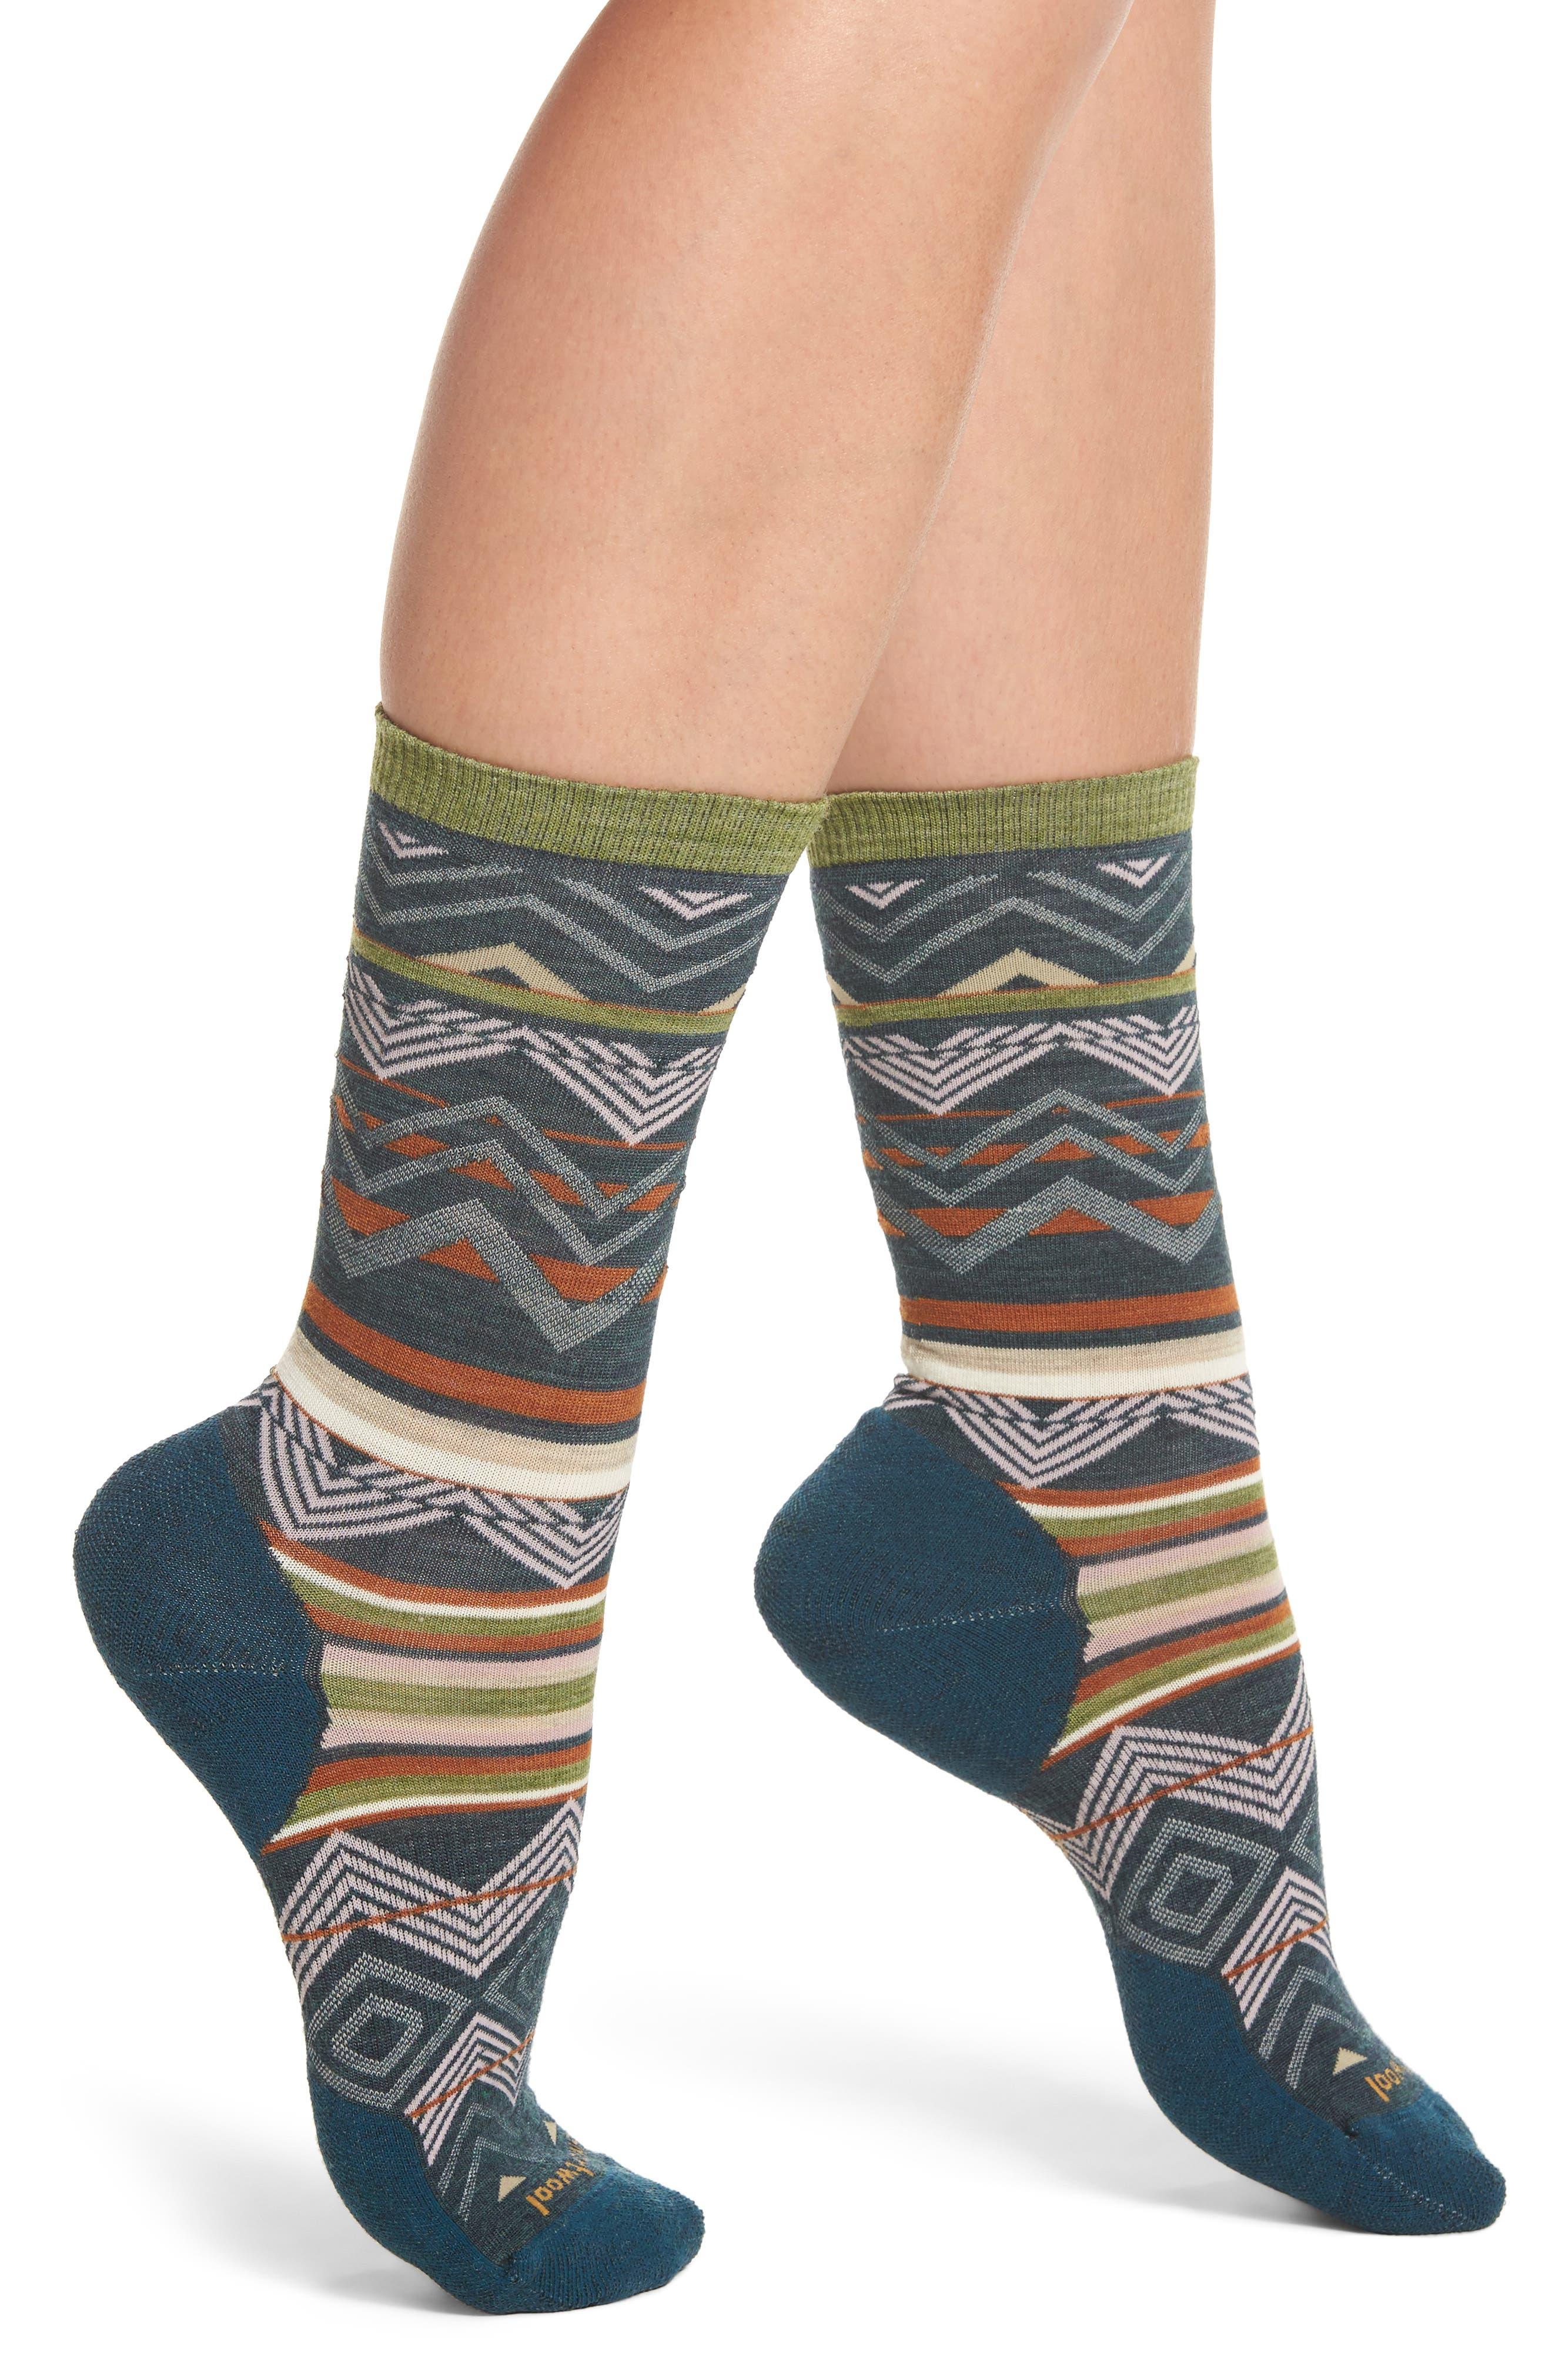 Smartwool Ripple Creek Crew Socks